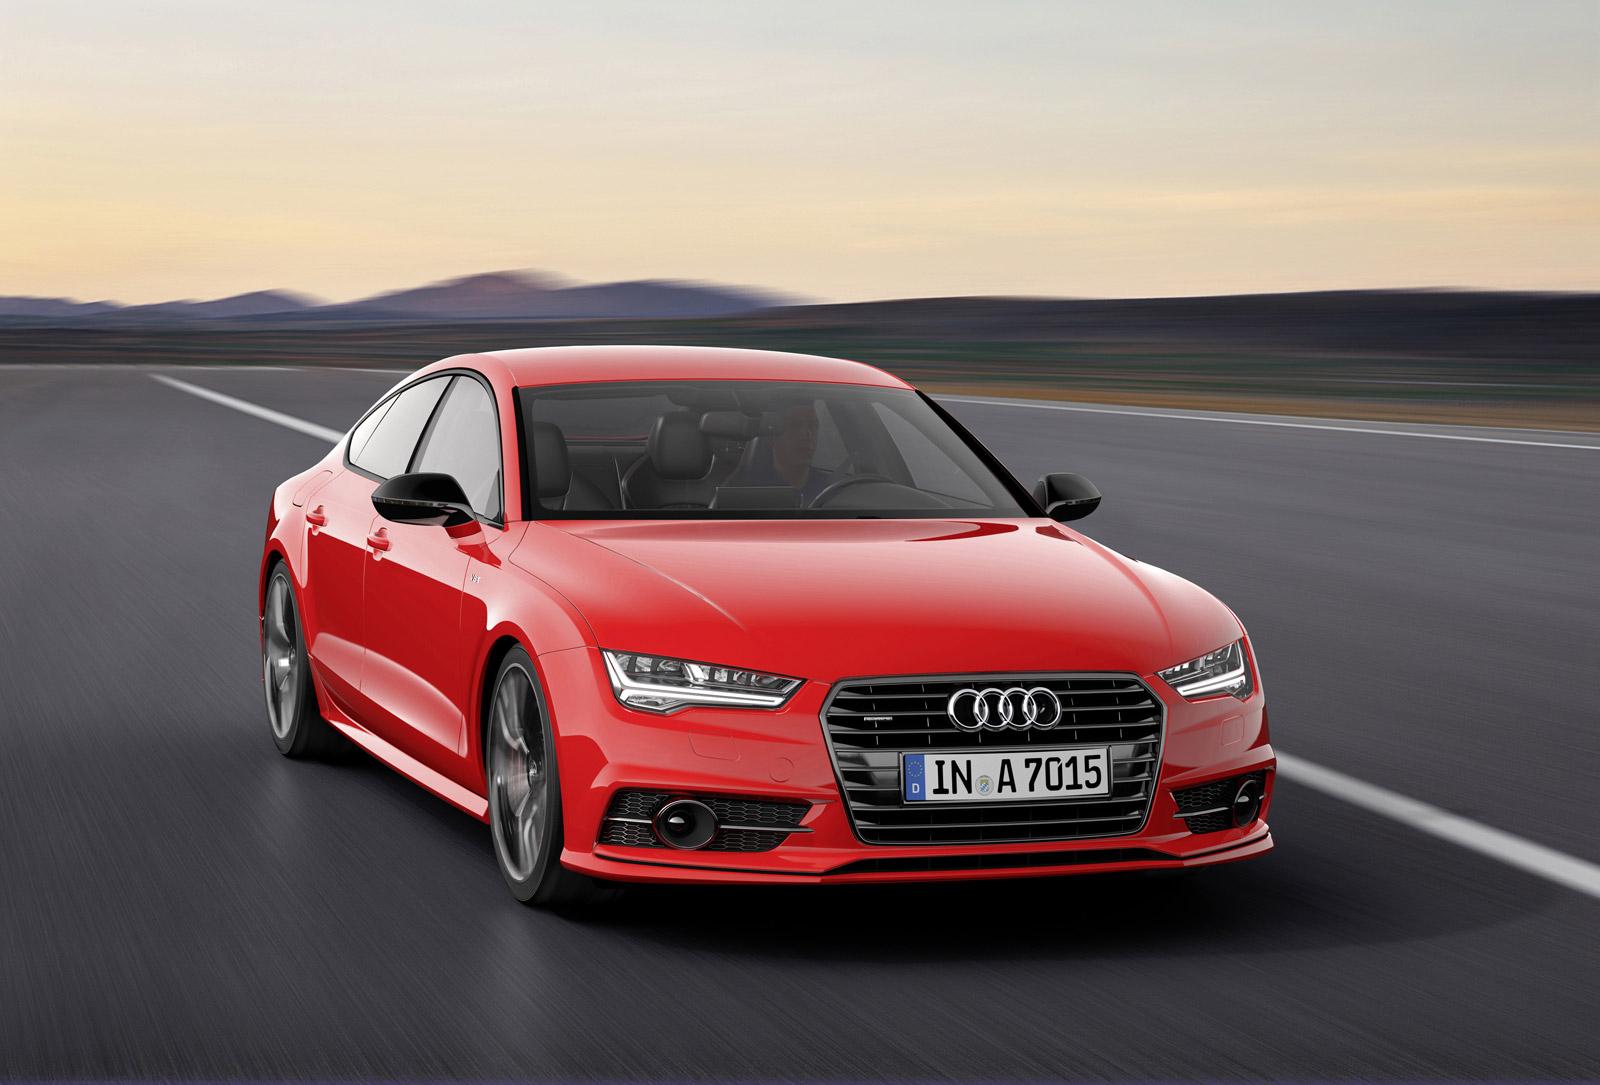 Kekurangan Audi A7 2014 Tangguh